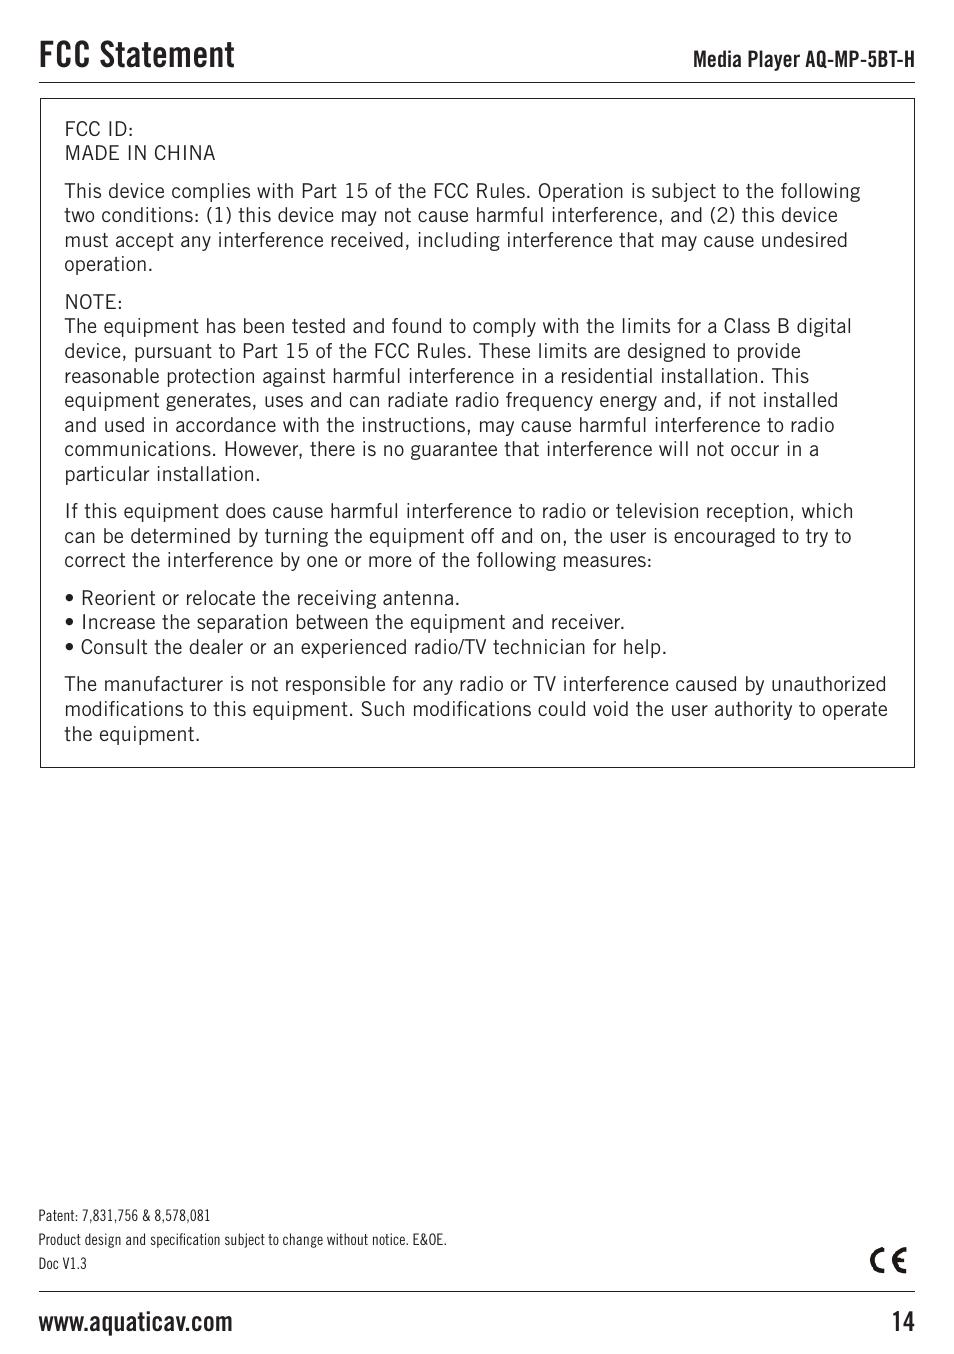 fcc statement aquatic av aq mp 5bt h user manual page 14 15 rh manualsdir com aquatic av owners manual Aquatic AV Wiring